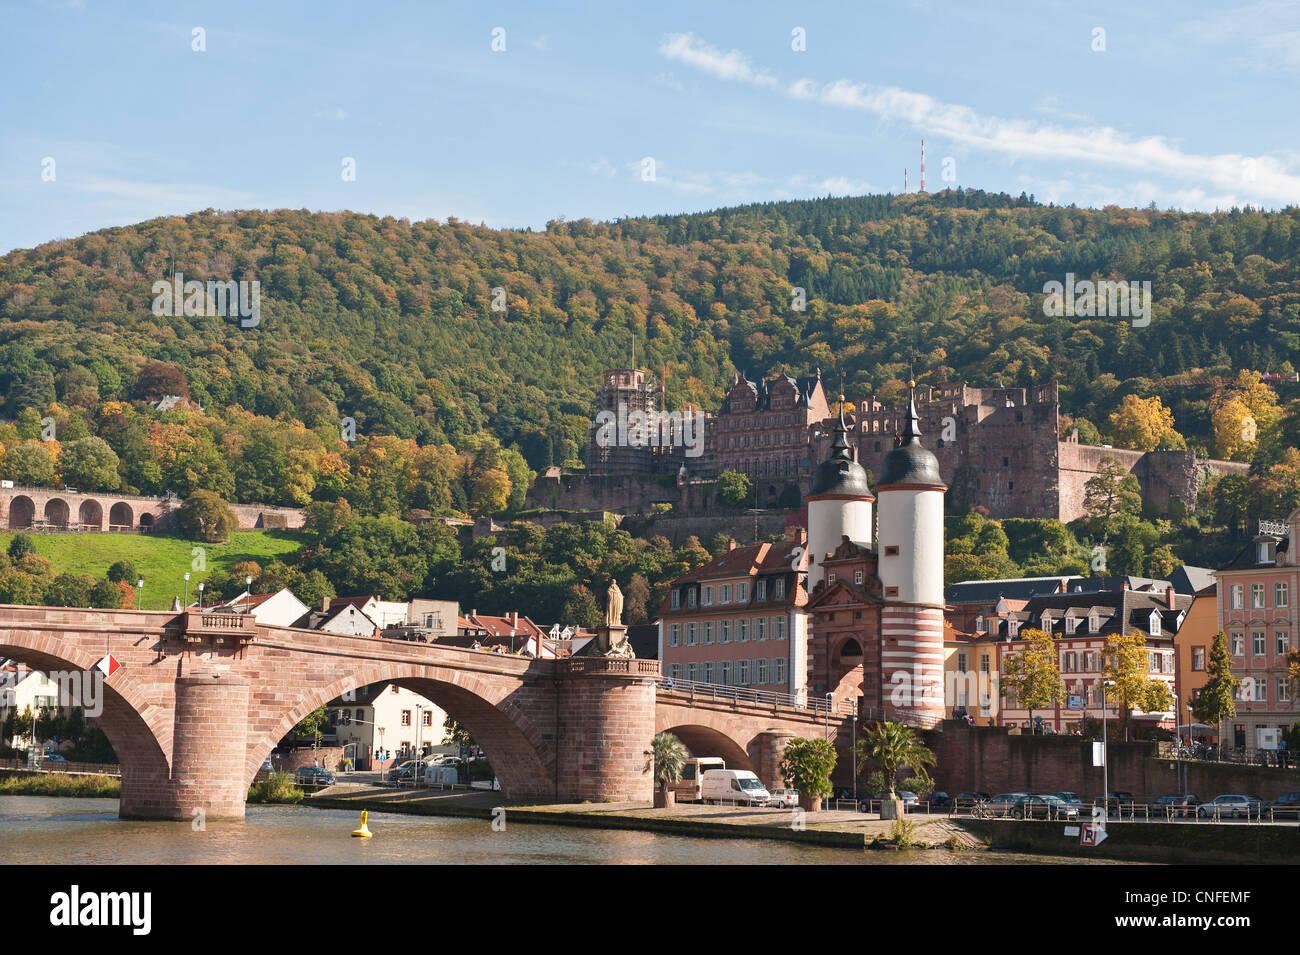 The Alte Brucke or Old Bridge and Neckar River in Old Town, Heidelberg, Germany. Stock Photo